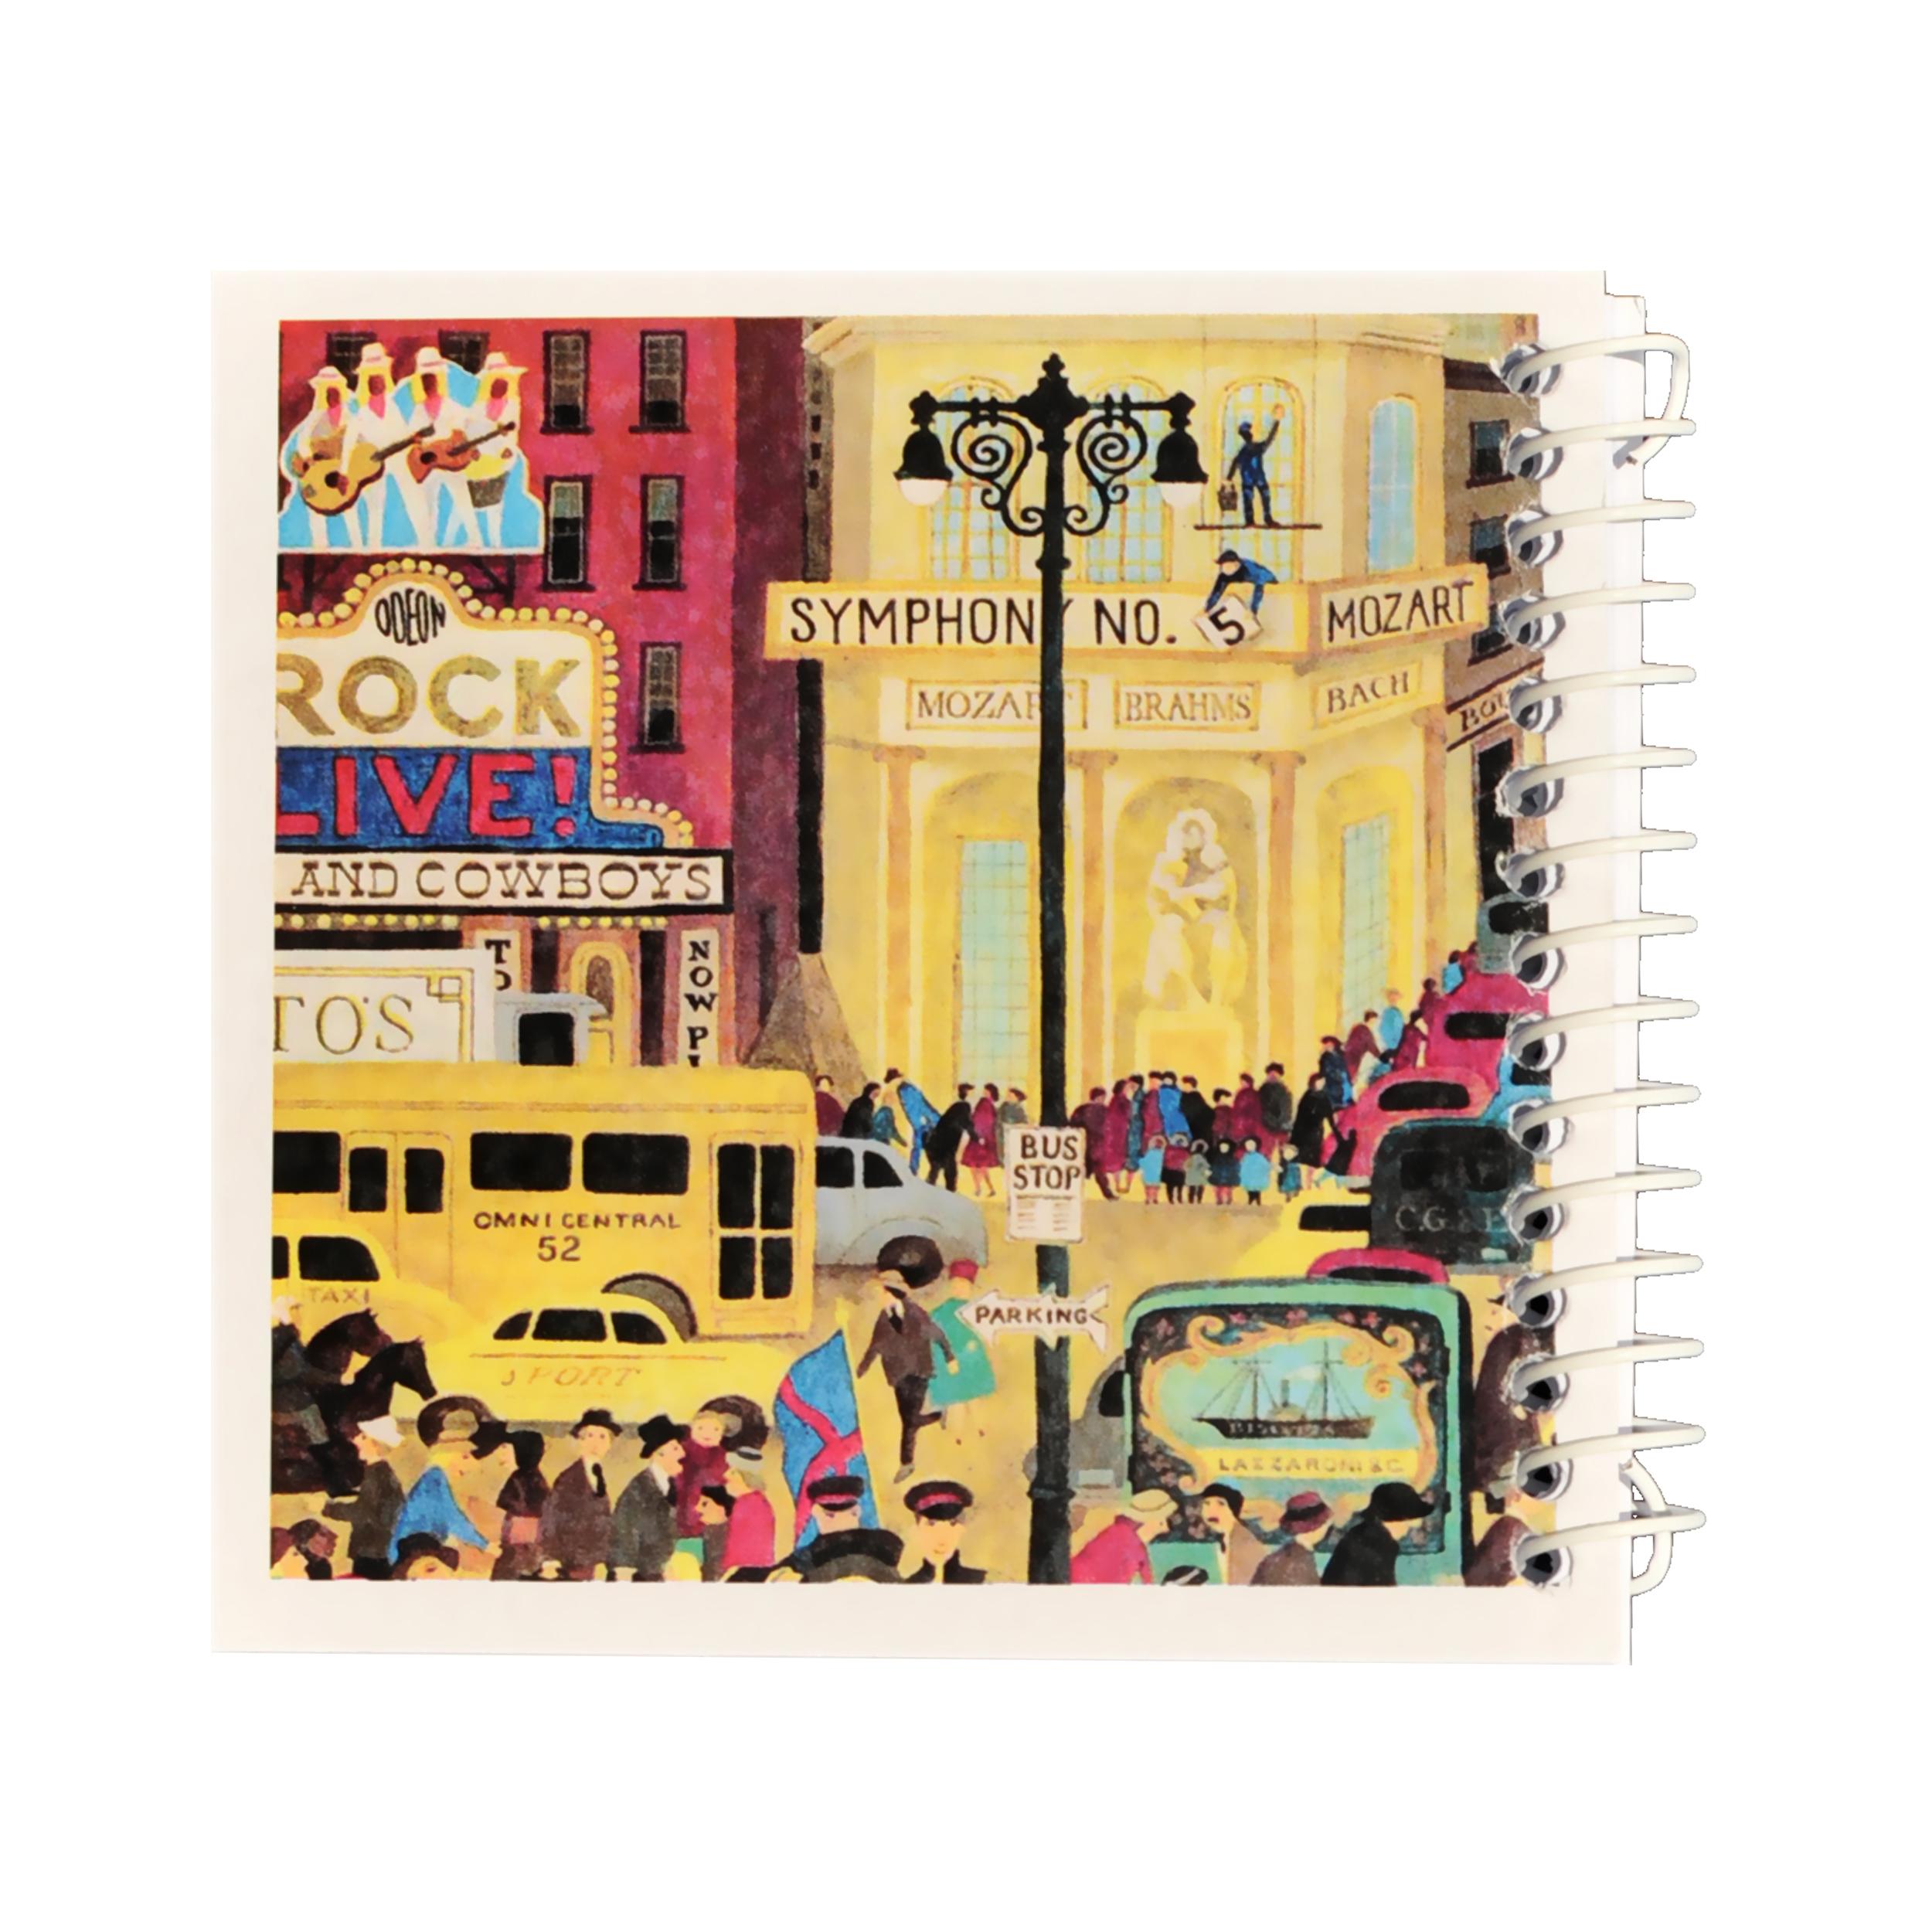 دفتر یادداشت ژوست طرح شهر پر هیاهو مدل کژوال کد ۰۱